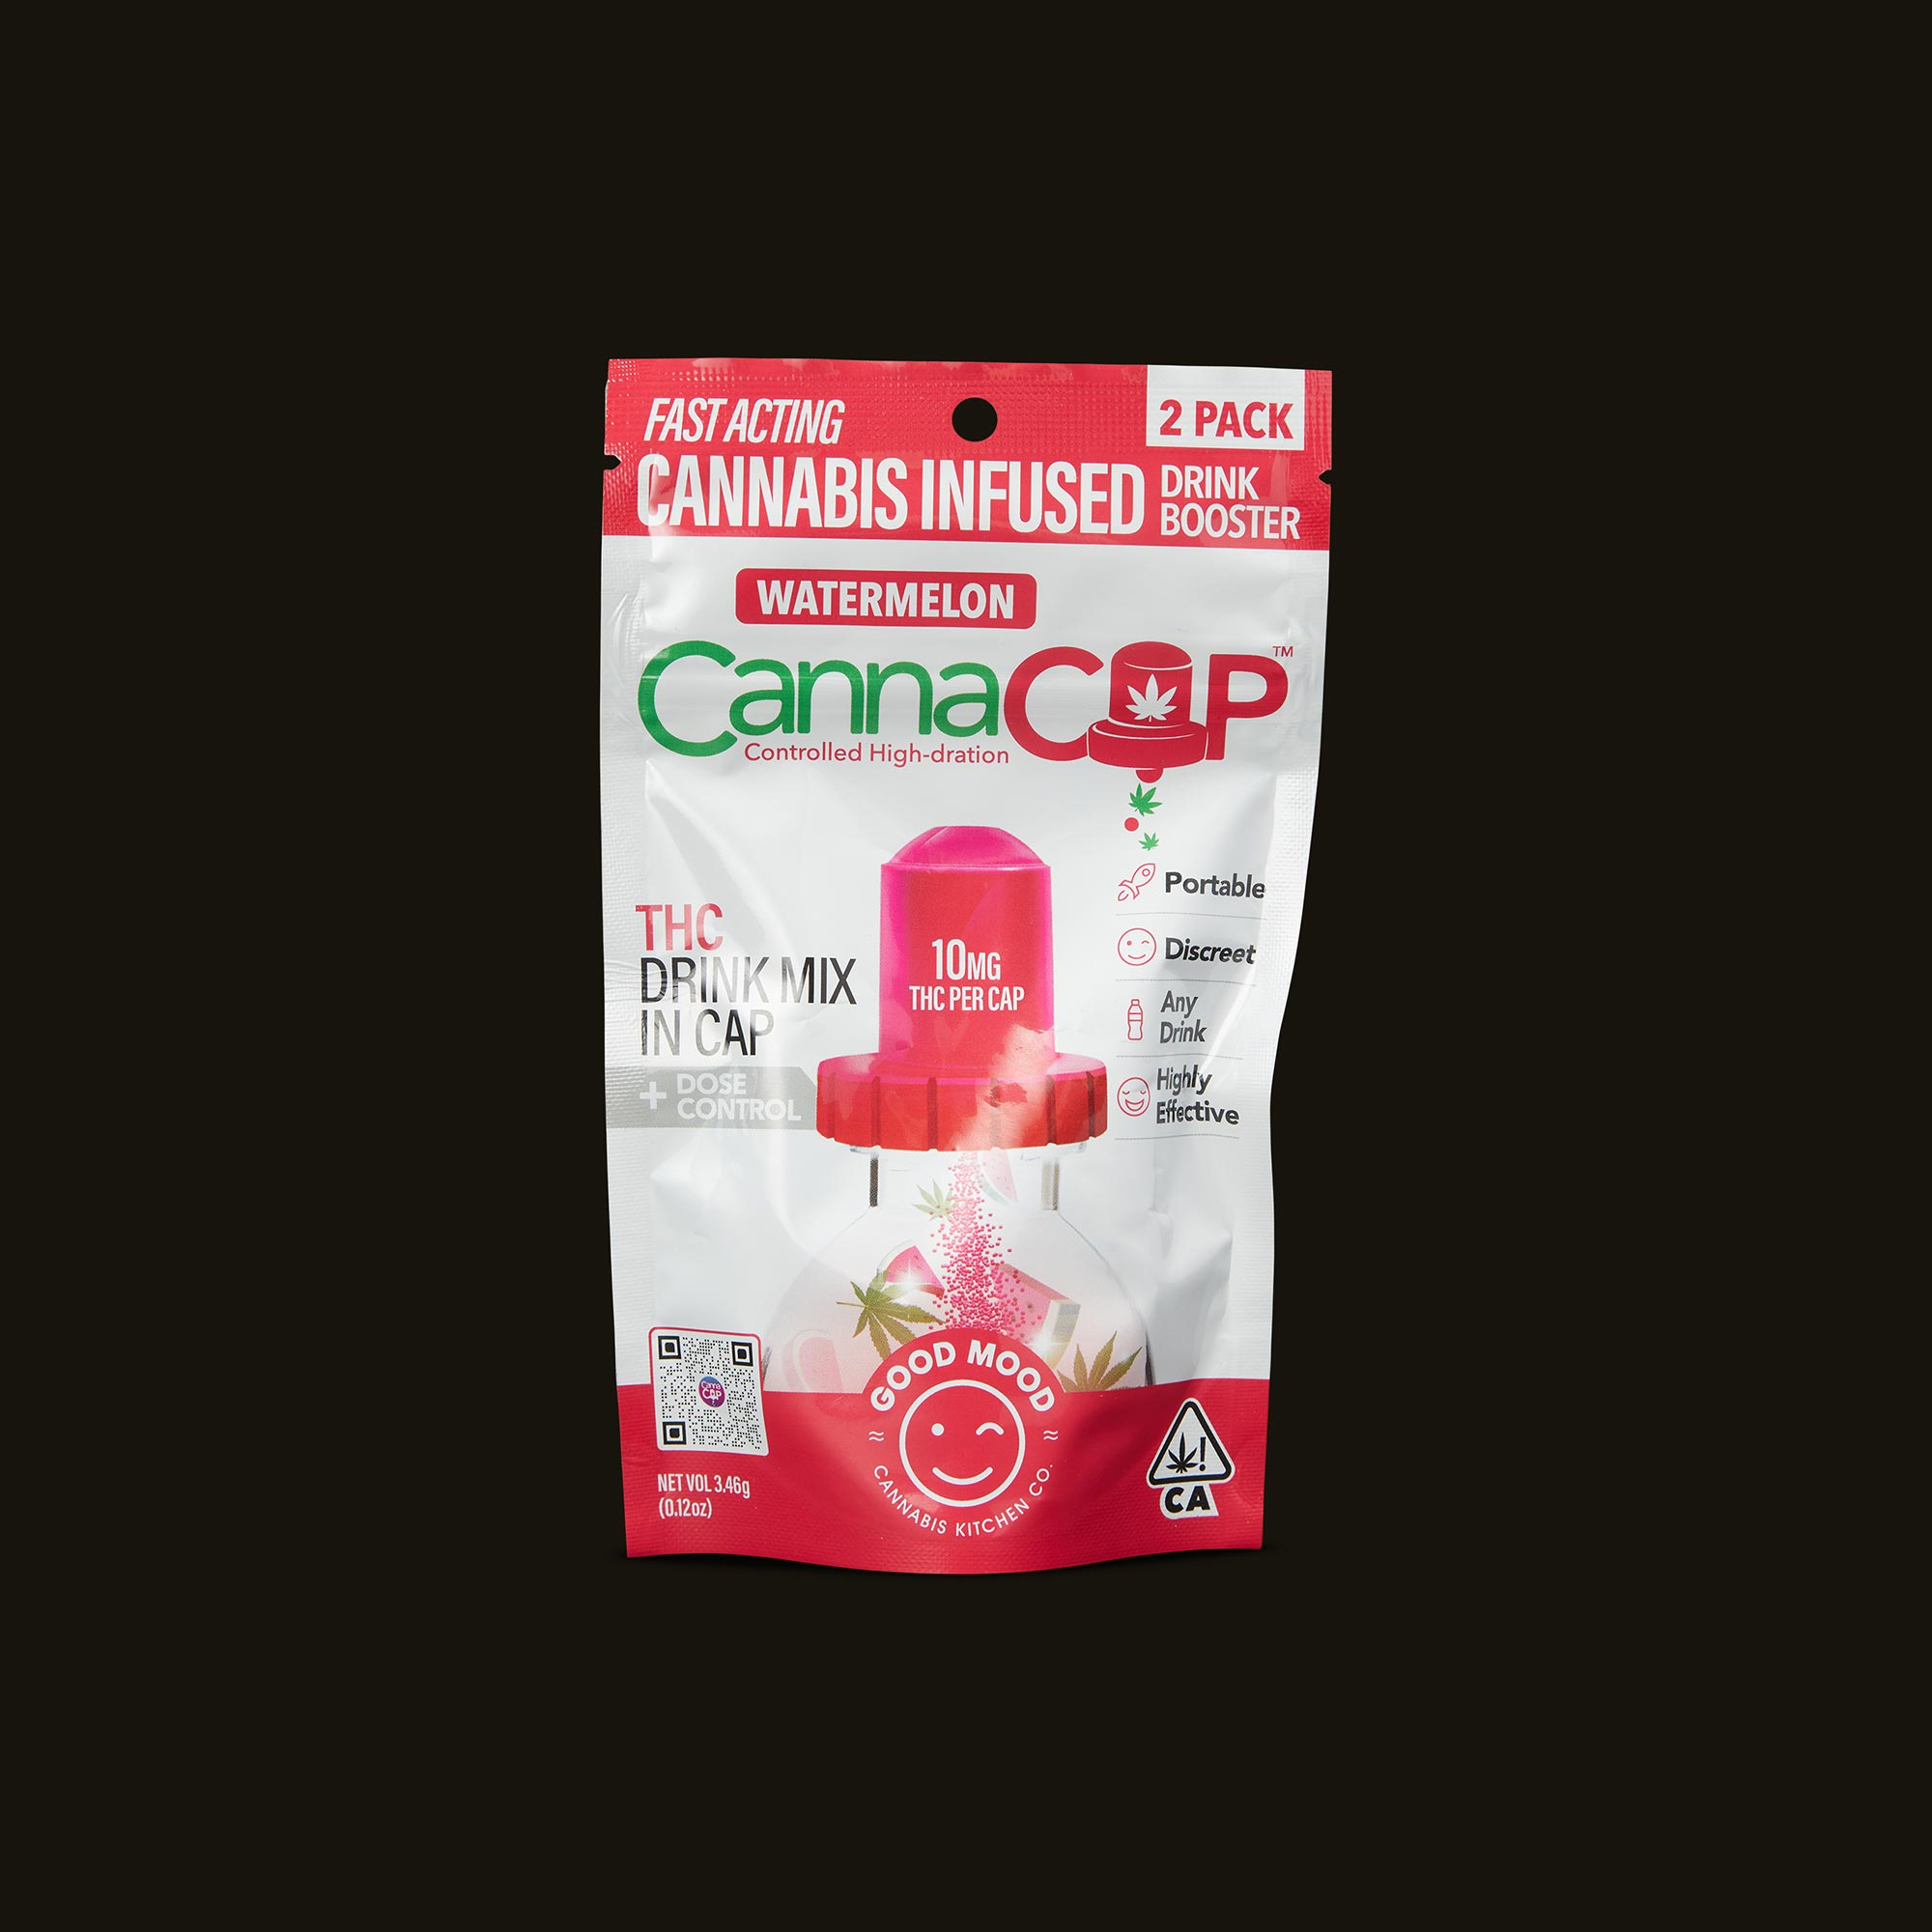 Watermelon CannaCap Drink Booster (2 Pack) - 2 servings per bag